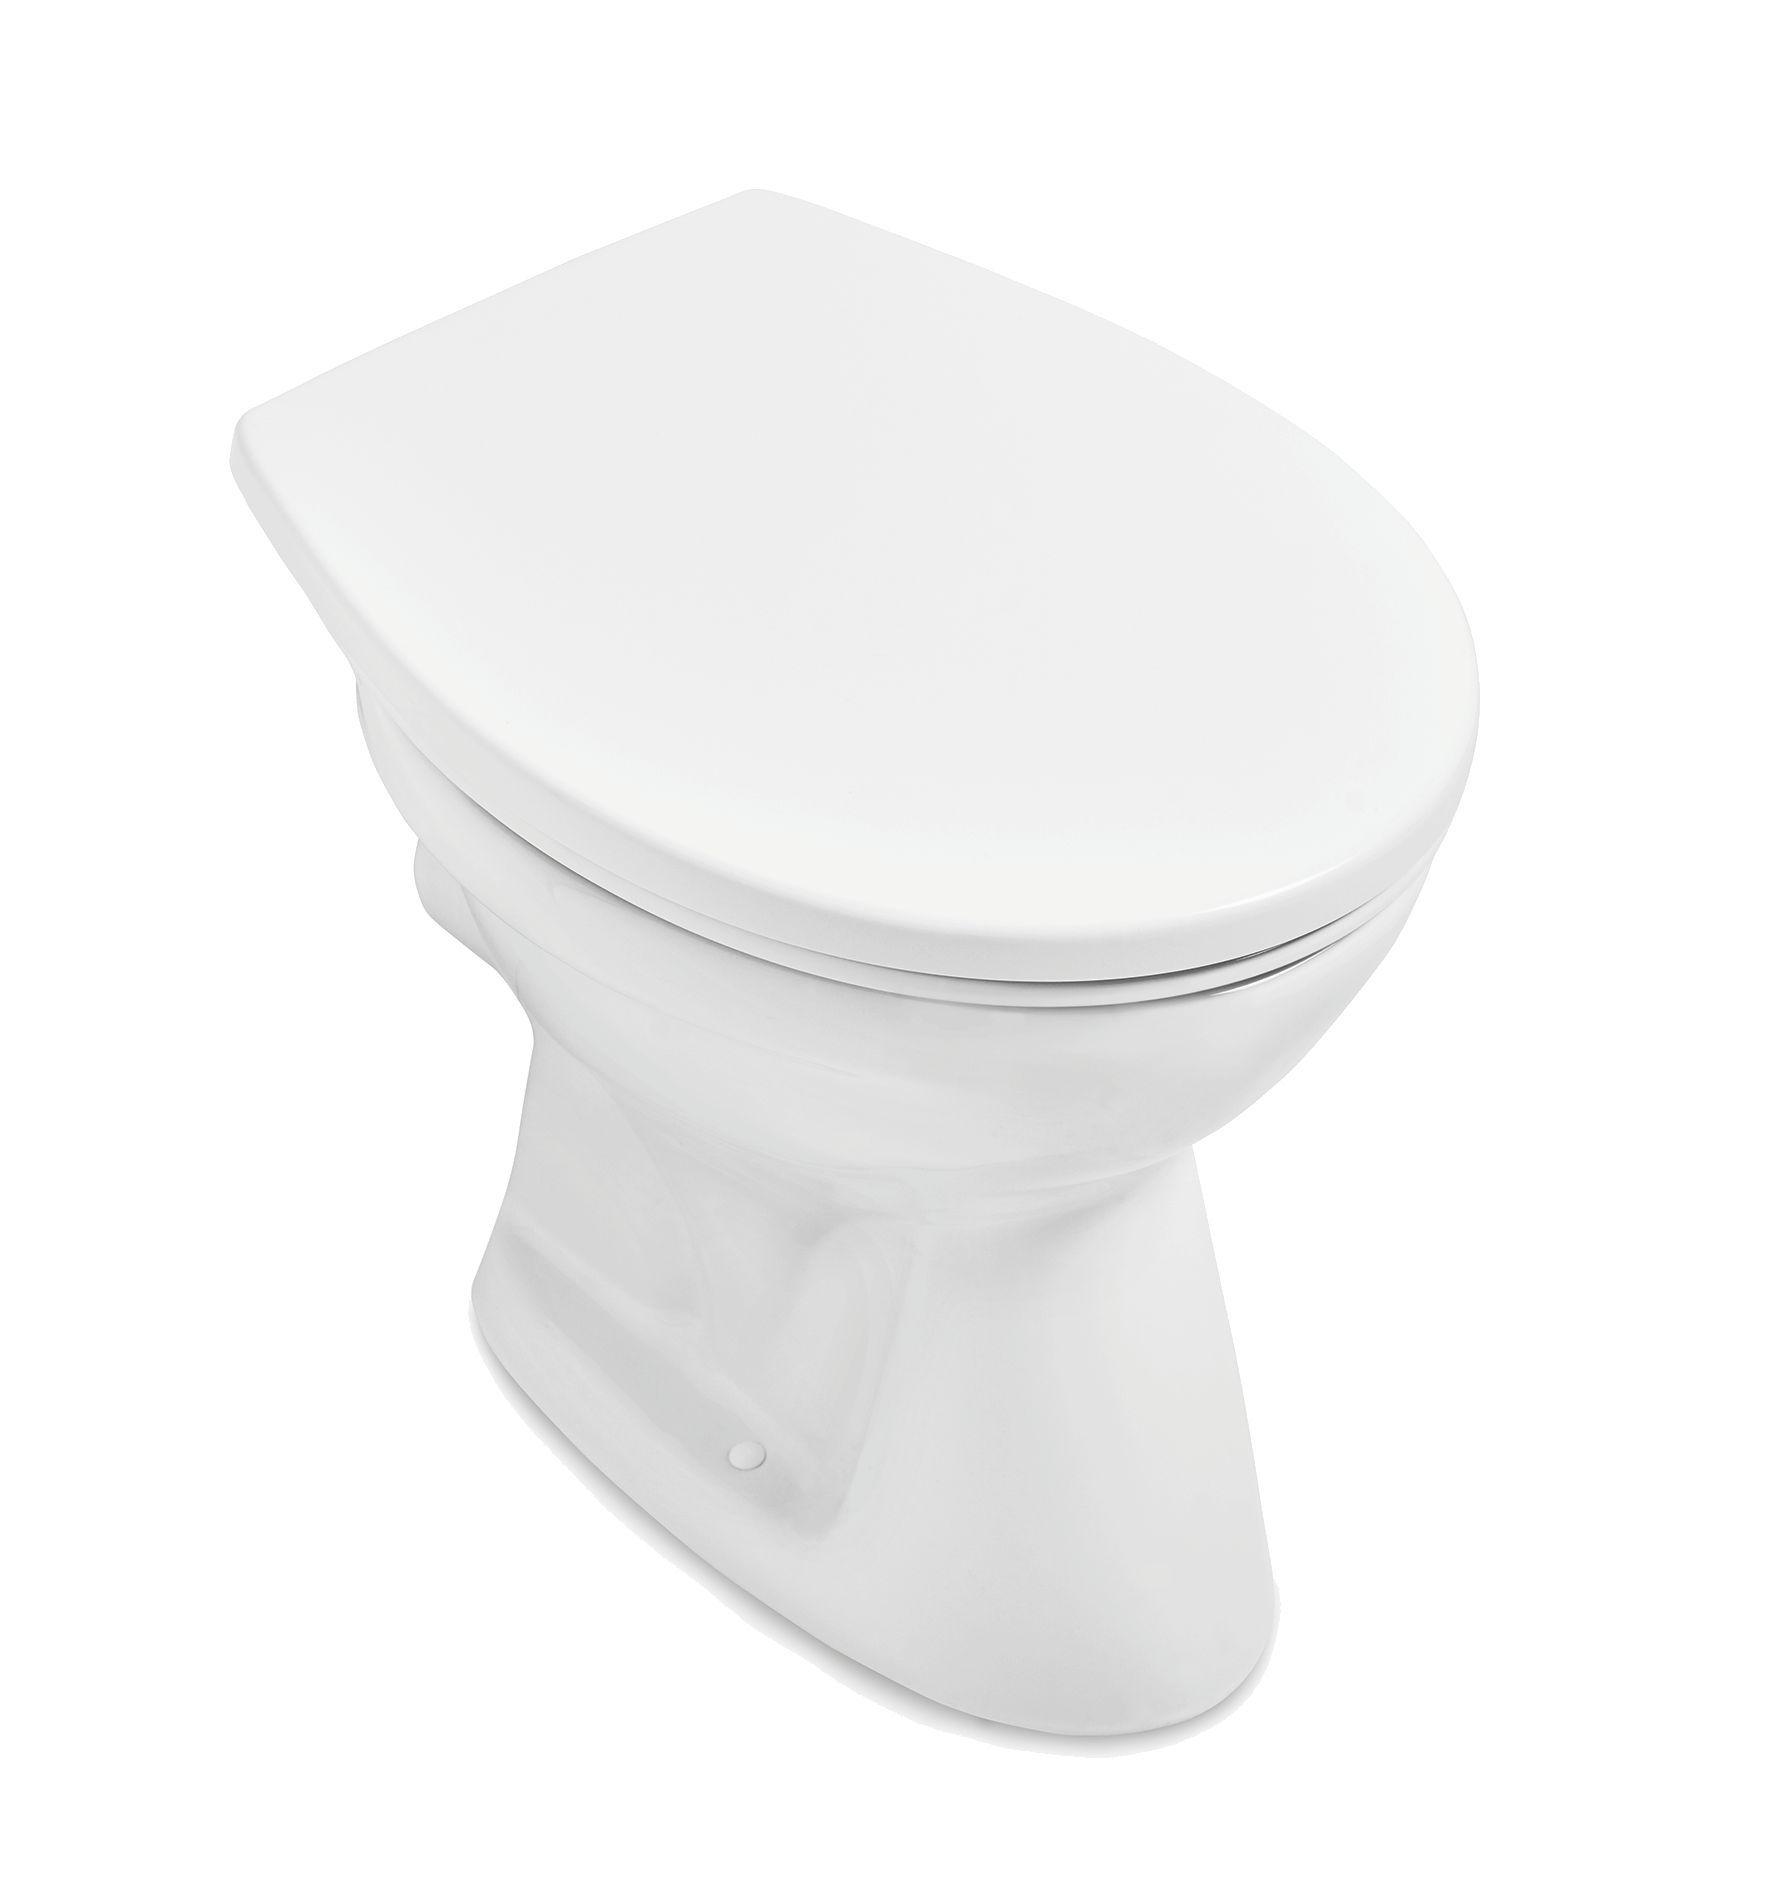 Villeroy & Boch O.novo Tiefspül-Stand-WC Abgang waagerecht L:45,5xB:35,5cm Weiß Alpin mit Ceramicplus 761810R1